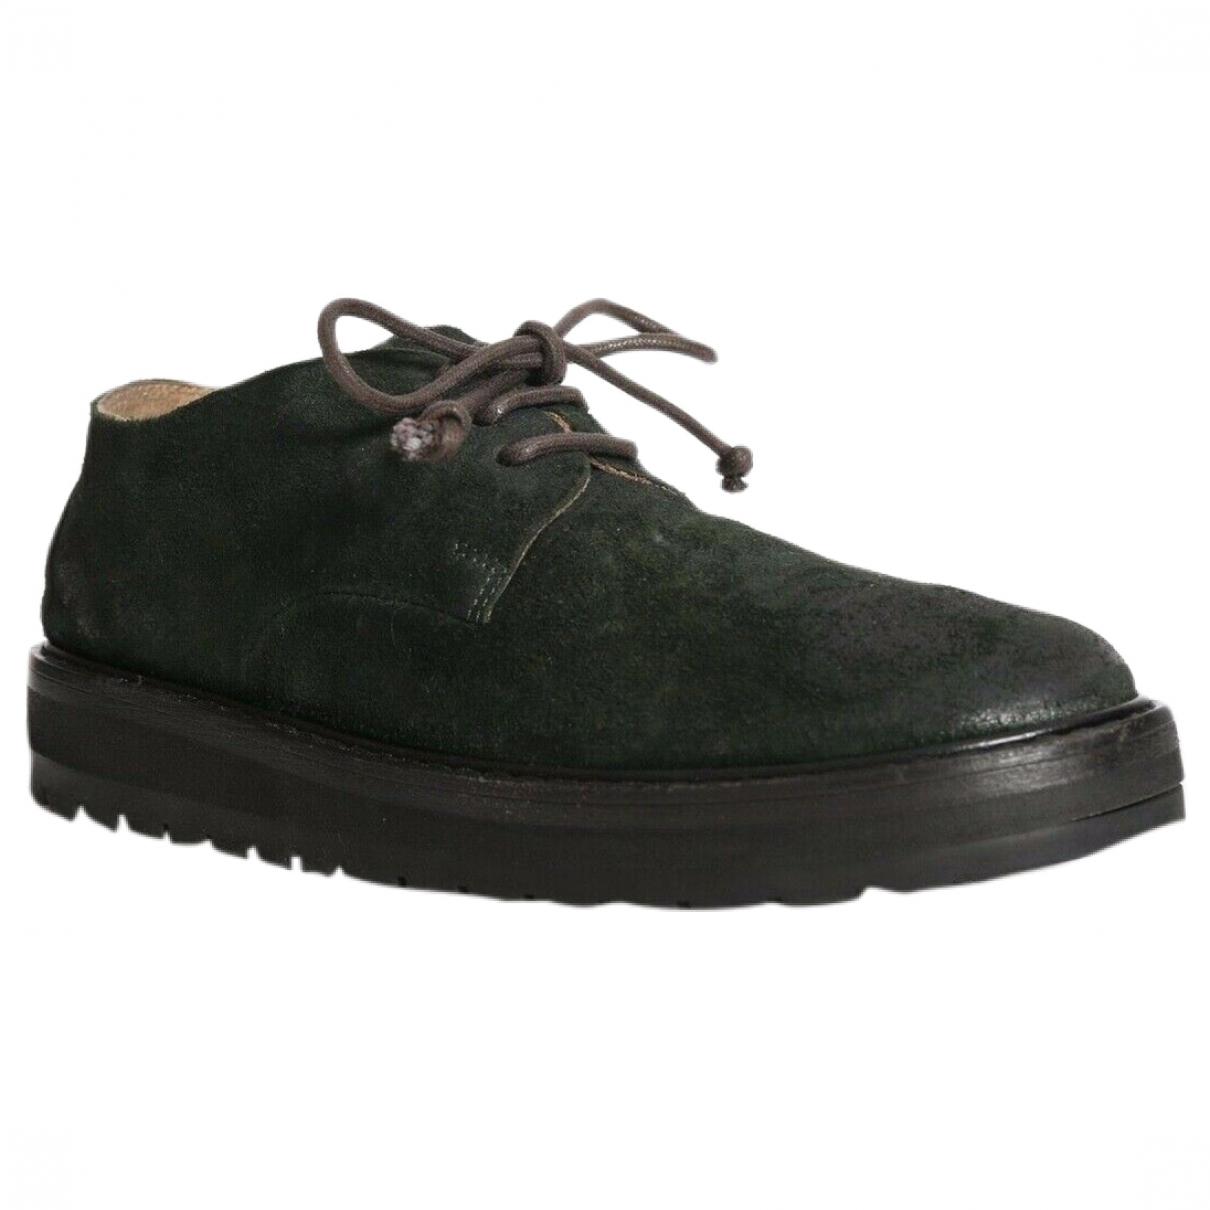 Marsèll \N Black Leather Flats for Women 36 EU